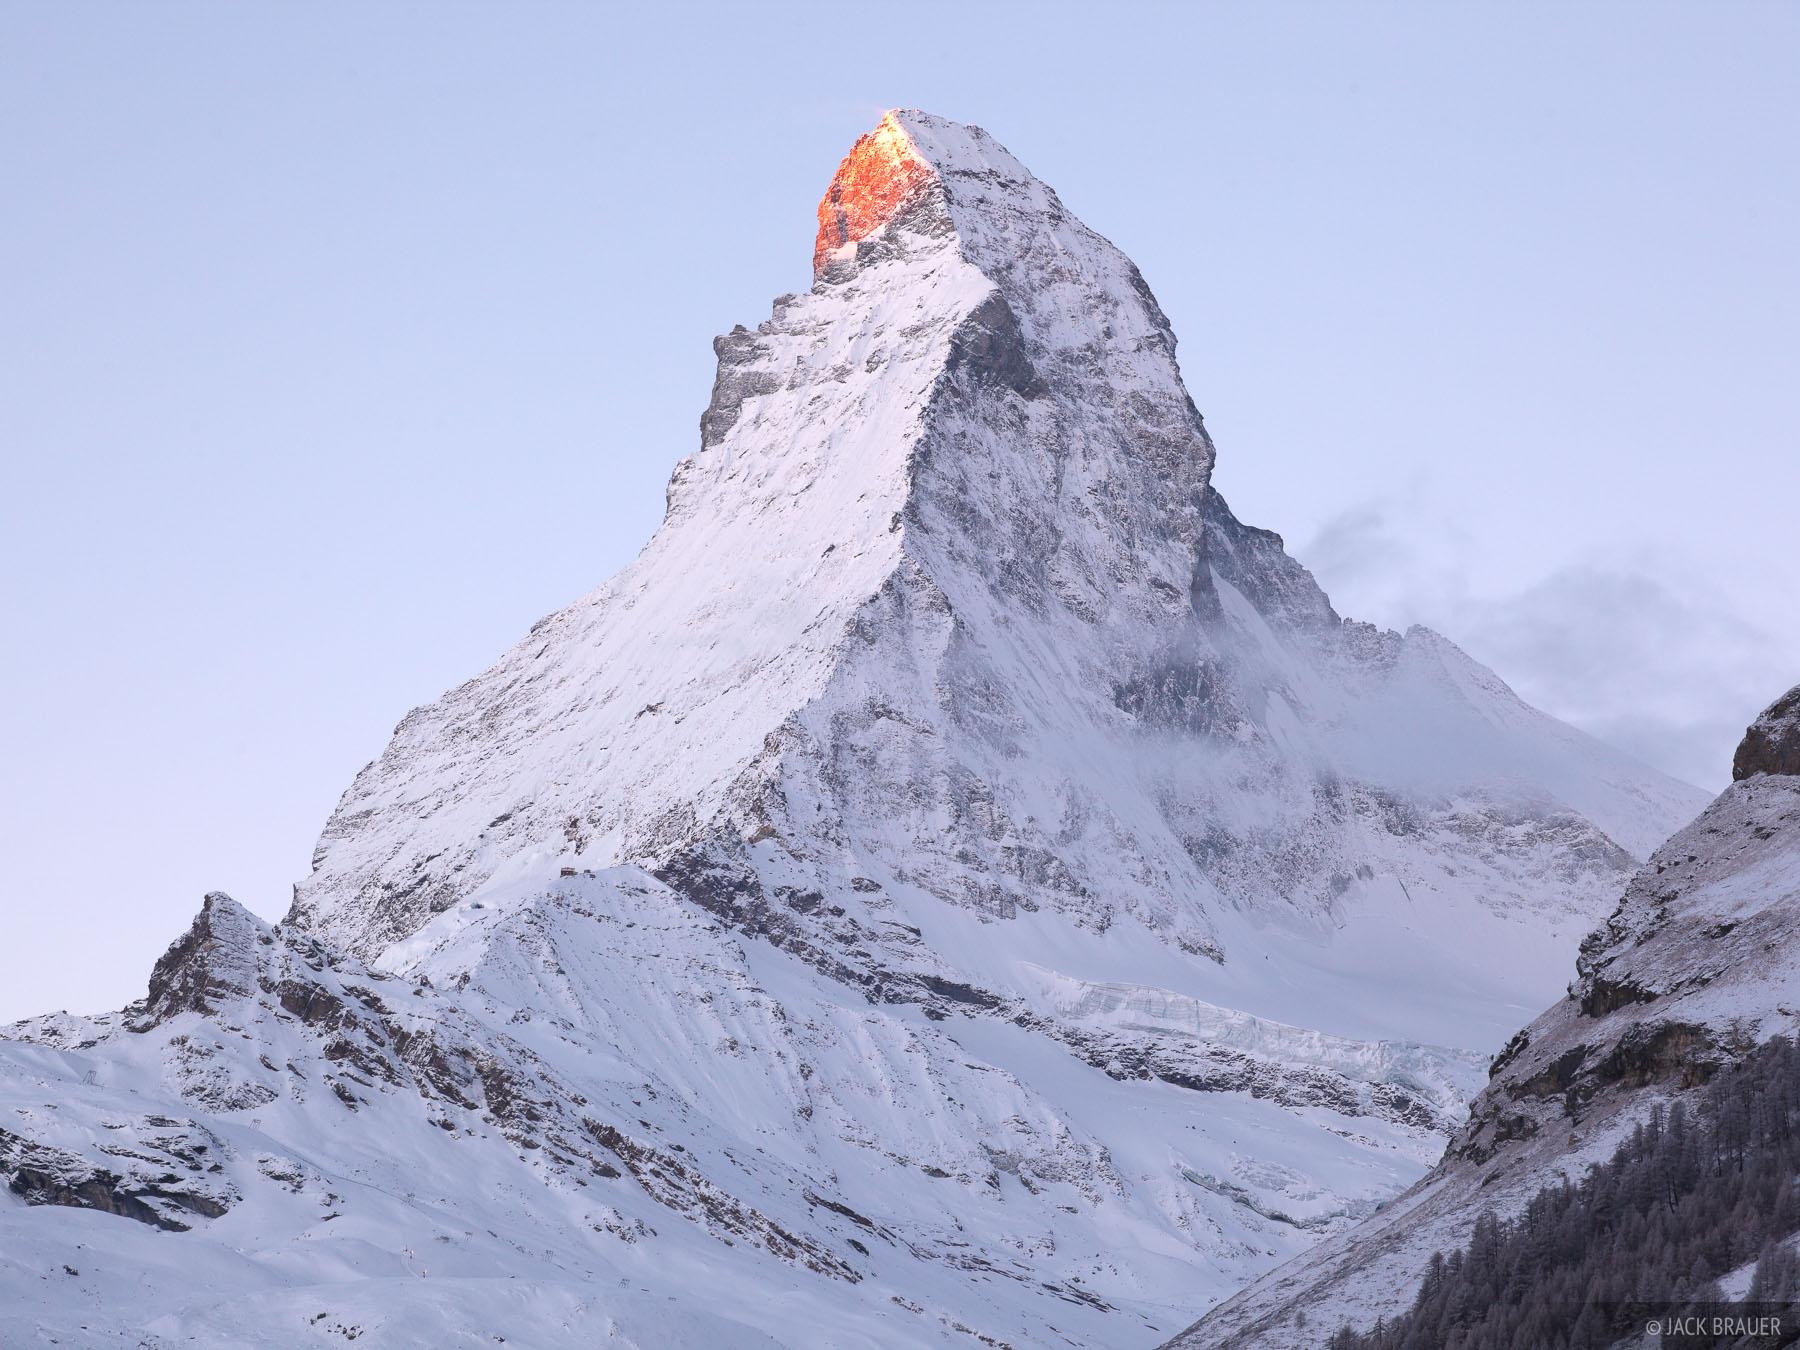 Matterhorn, Switzerland, Zermatt, sunrise, photo